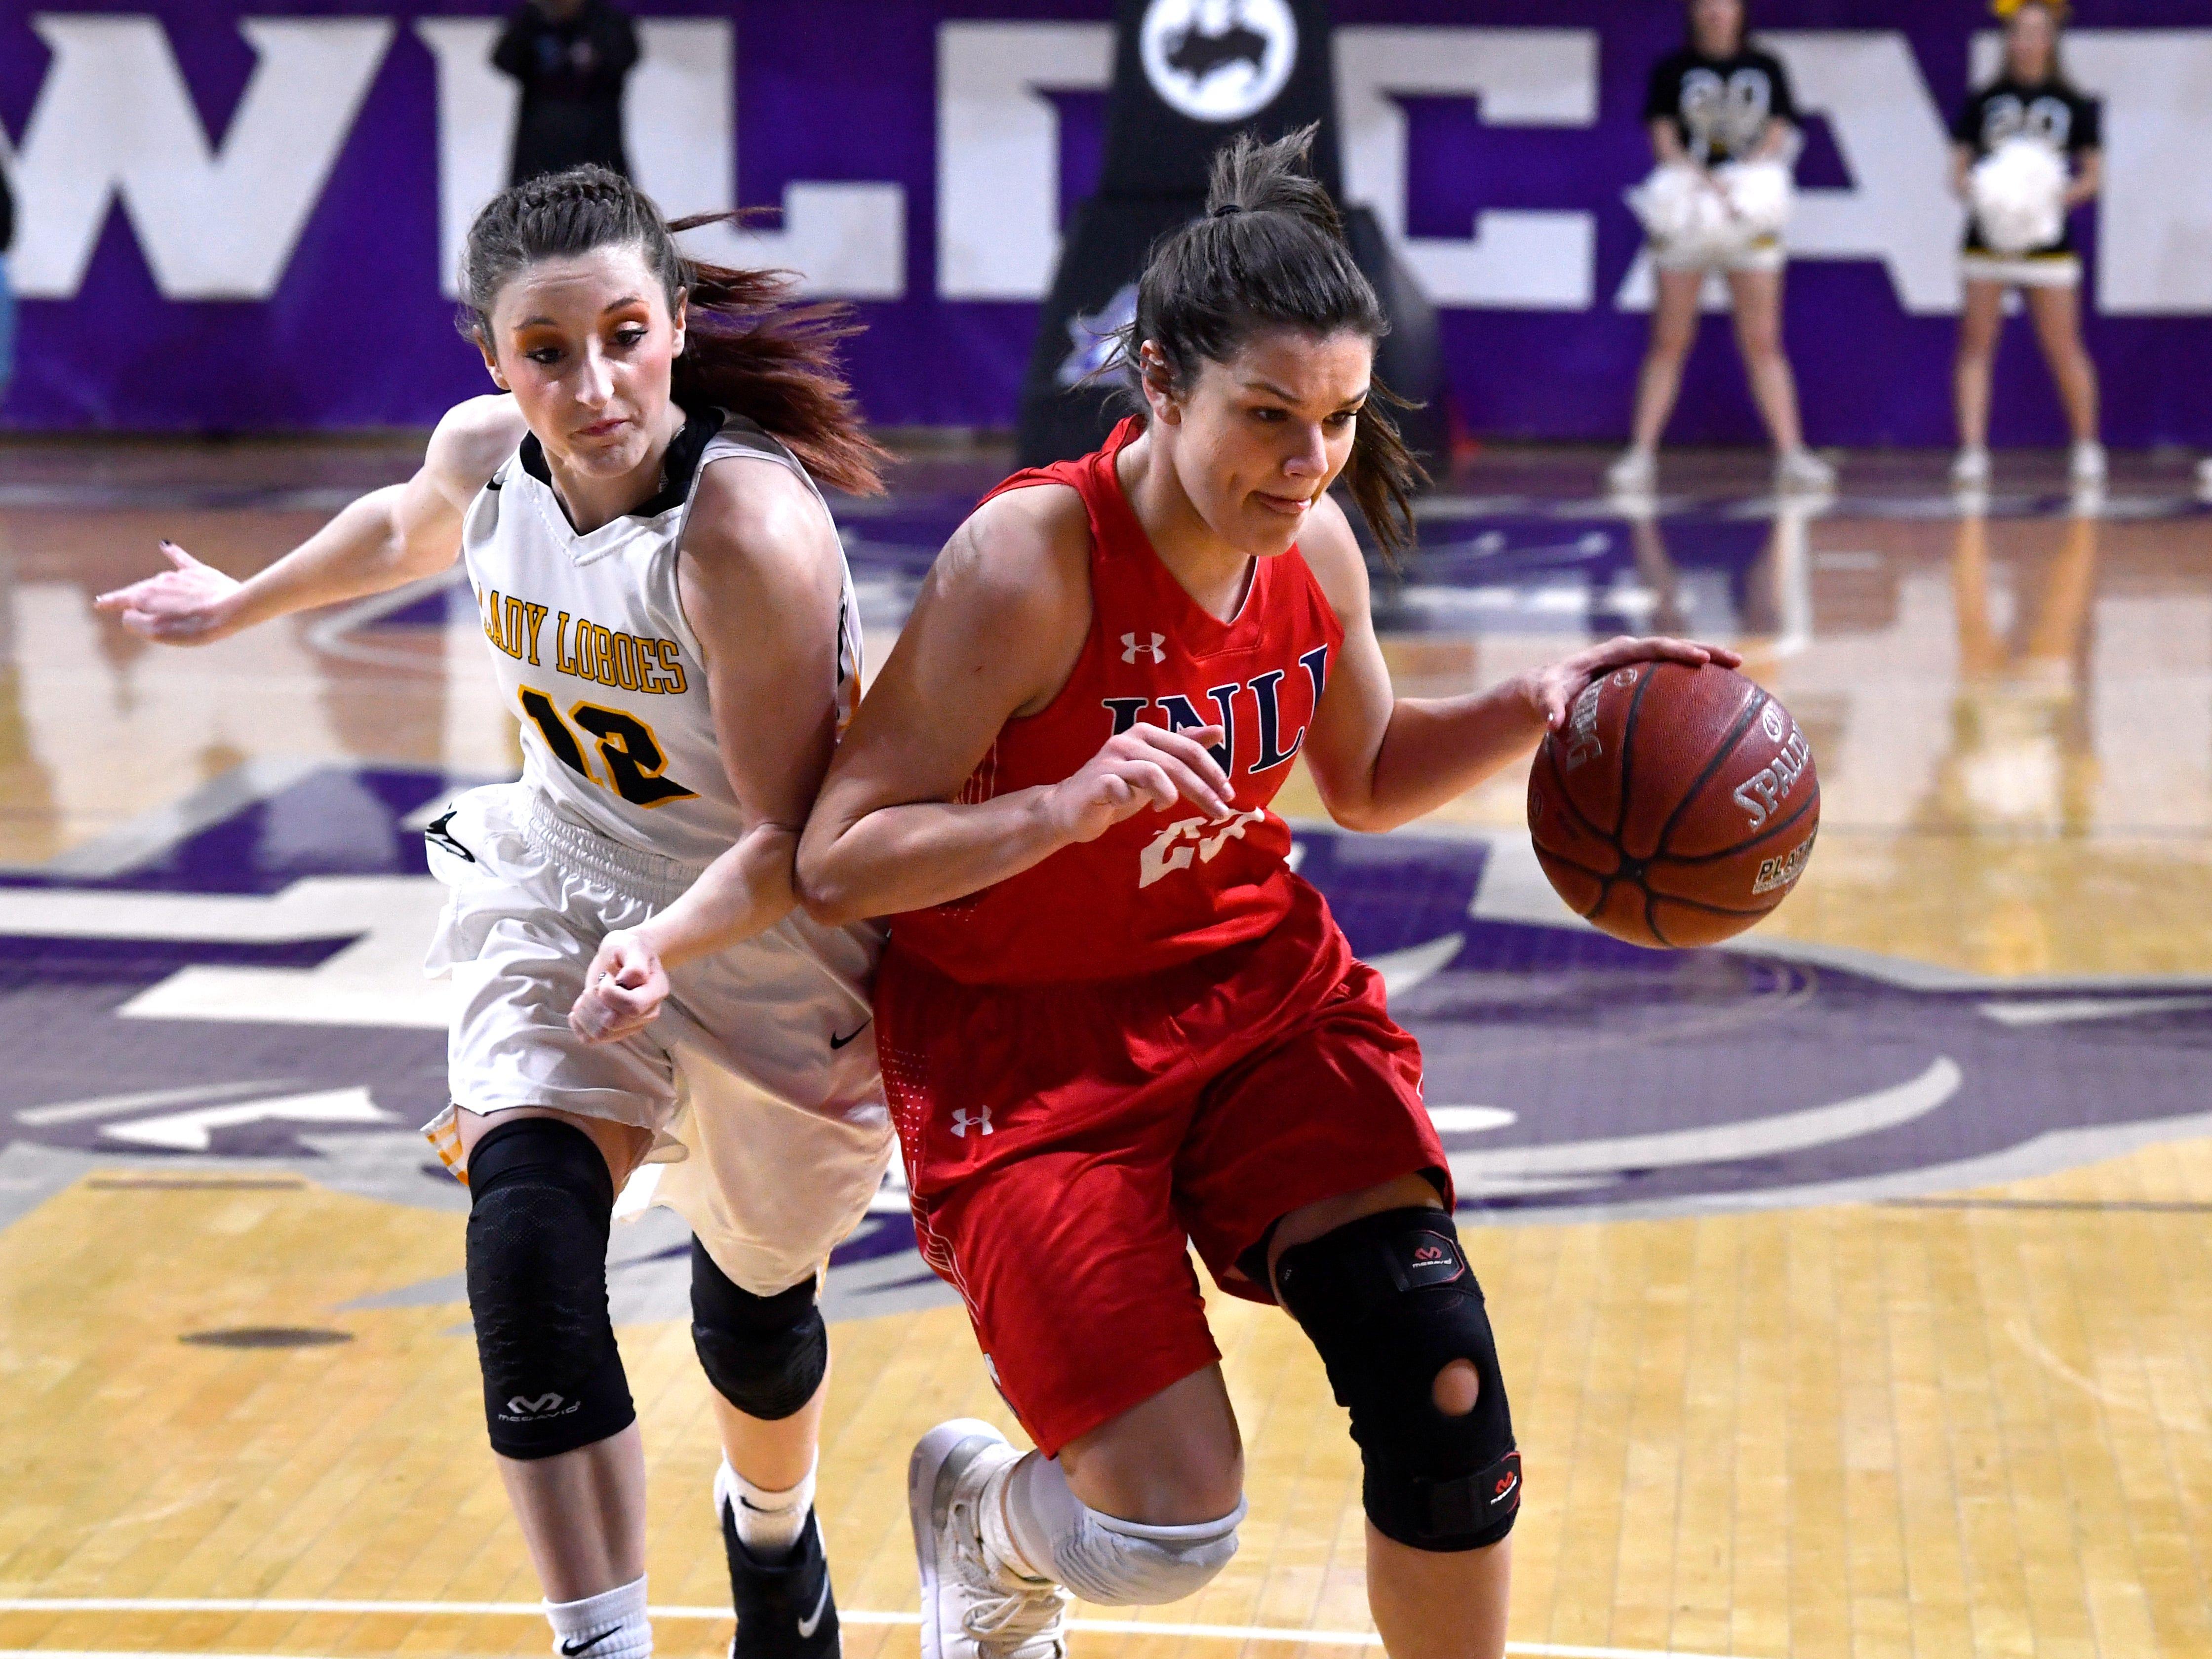 Cisco's Katelyn Bird (left) bumps Jim Ned's Libby Tutt during Tuesday's Region 1 3A basketball all quarter-finals at Abilene Christian University Feb. 19, 2019. Final score was 46-31, Jim Ned.